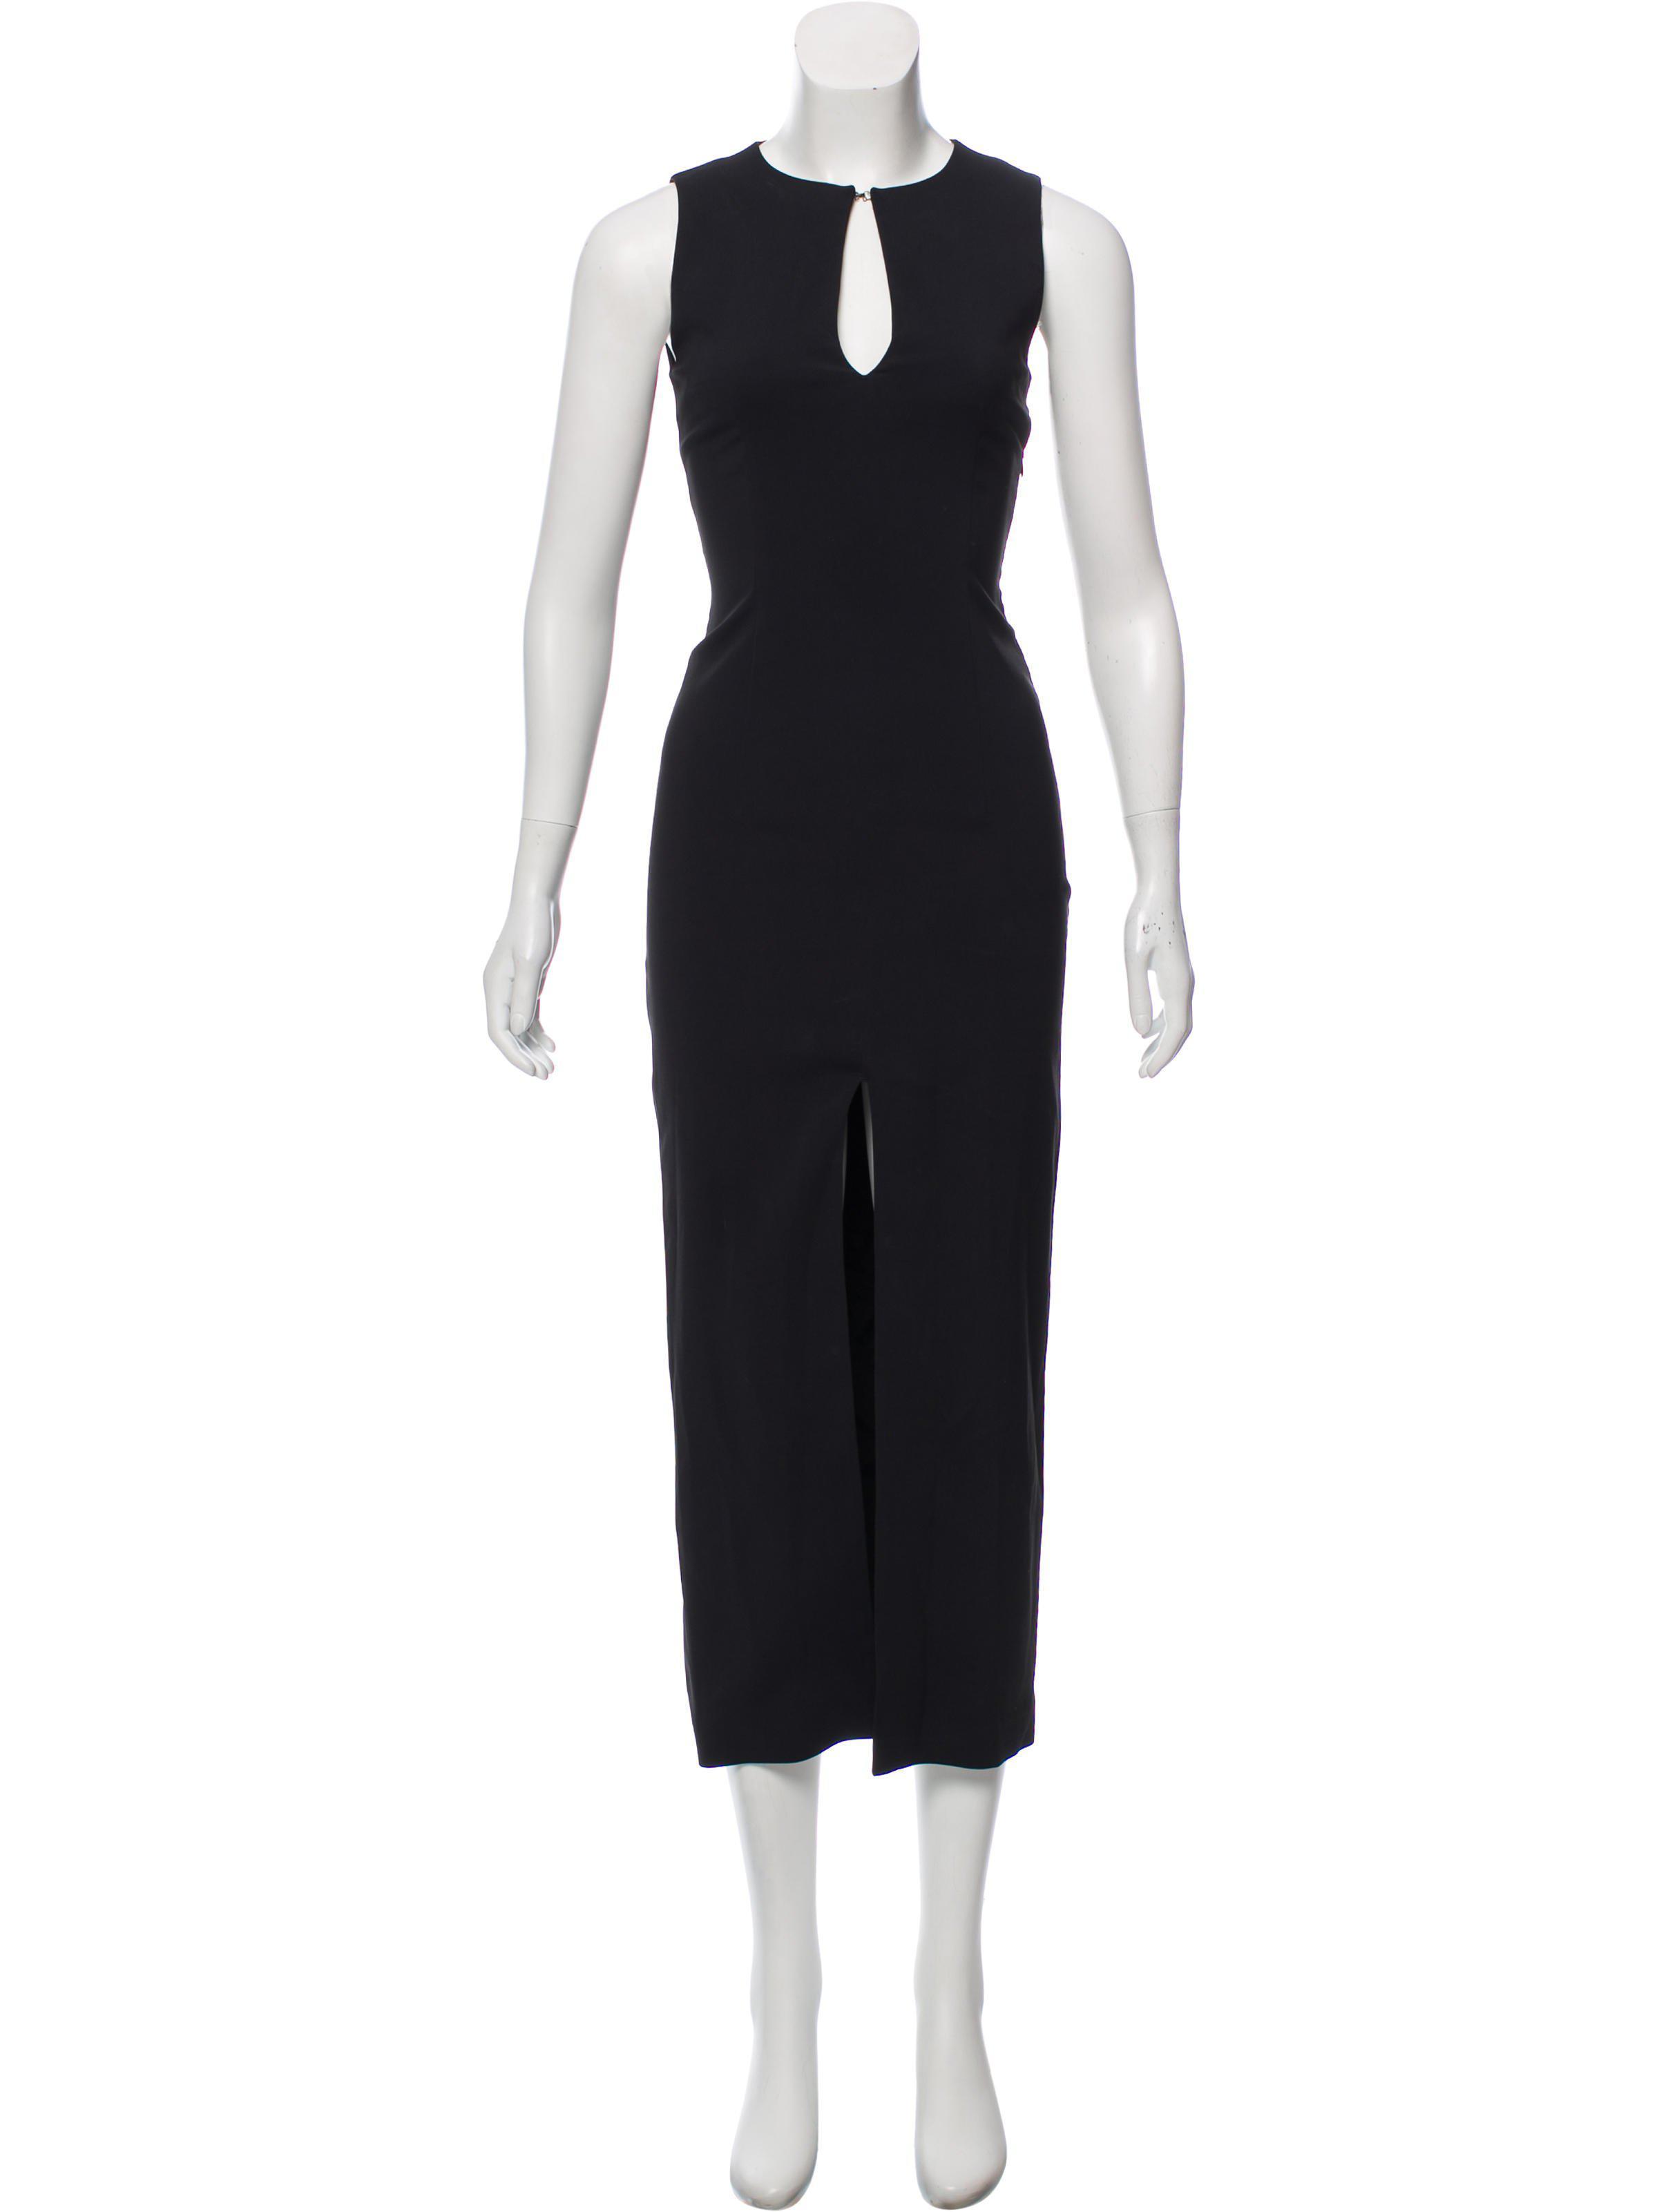 a25b43f0 Acne - Black Sleeveless Maxi Dress - Lyst. View fullscreen